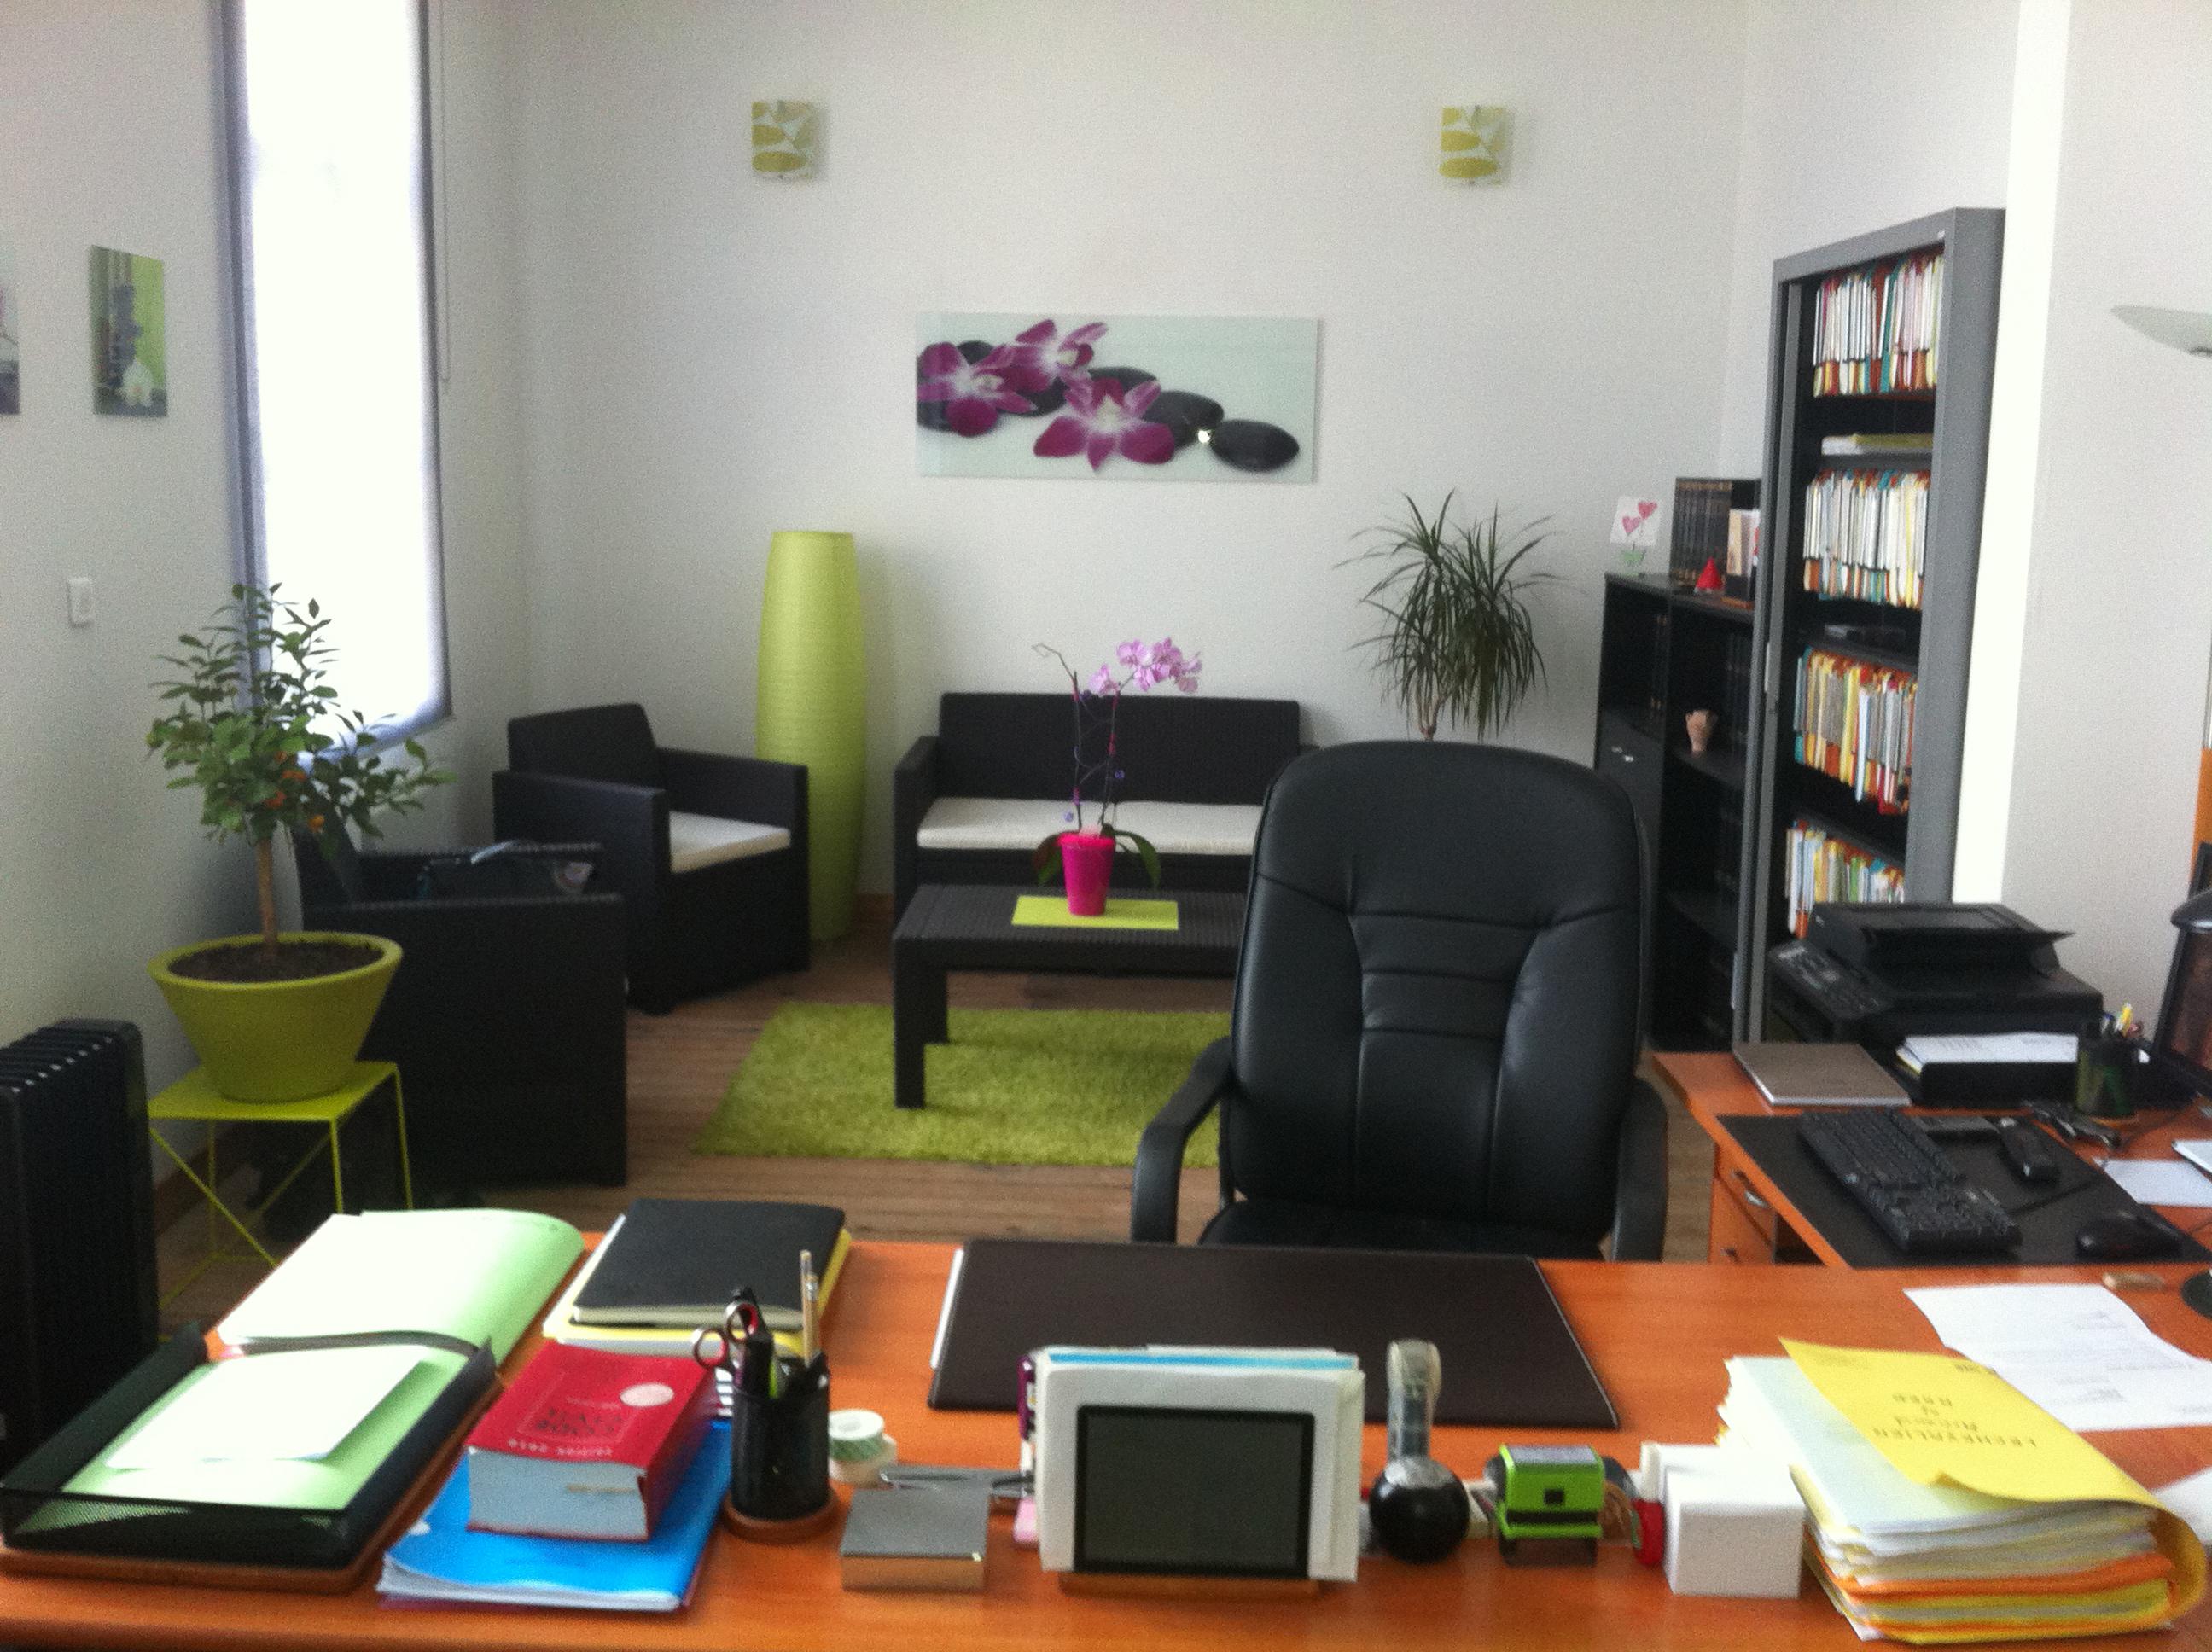 avocat divorce amiens cabinet avocat amiens. Black Bedroom Furniture Sets. Home Design Ideas